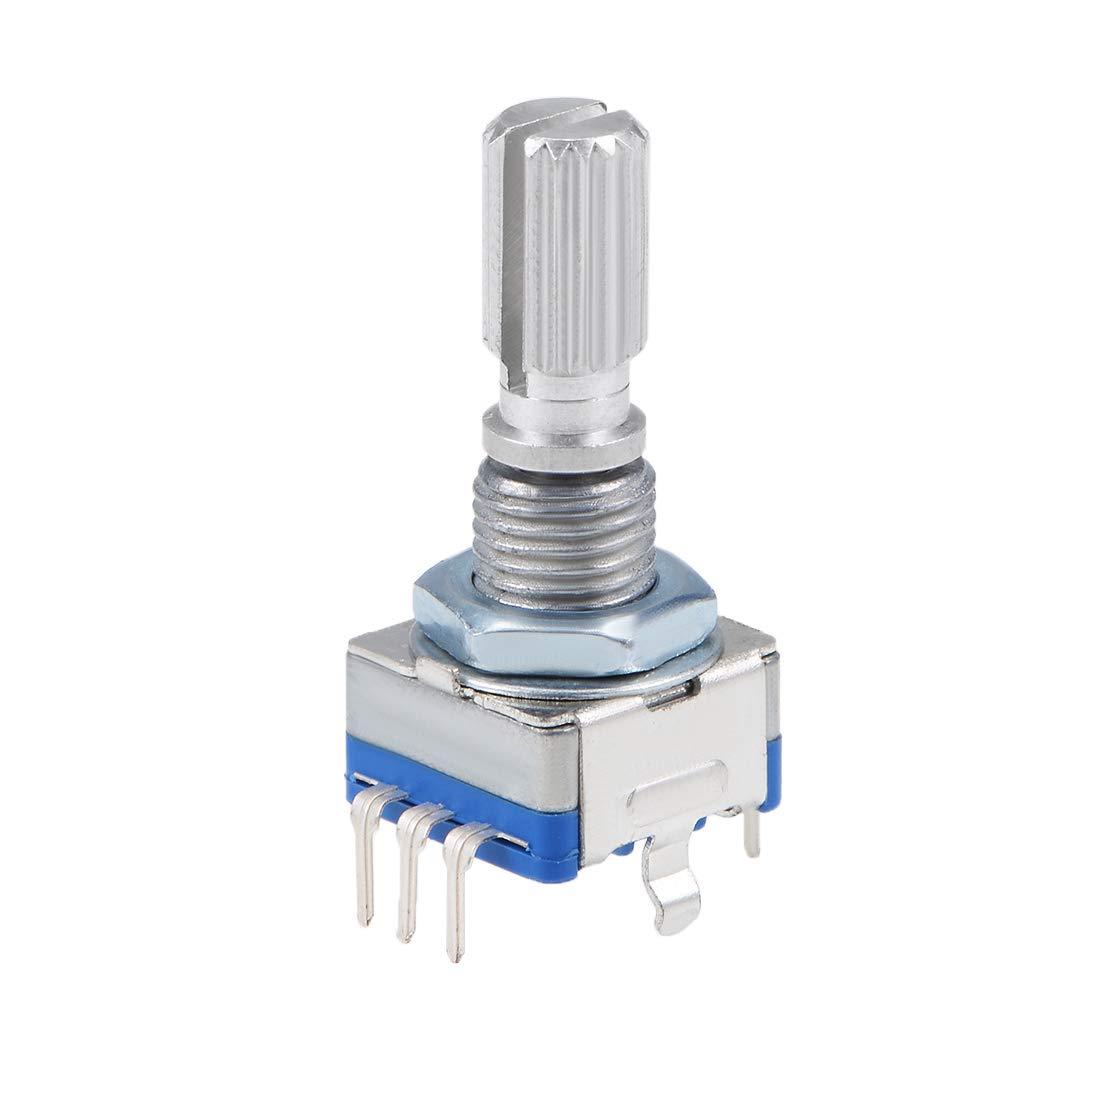 sourcing map 360 Degree Rotary Encoder Code Switch Digital Potentiometer EC11 7 Pins 20mm 5pcs